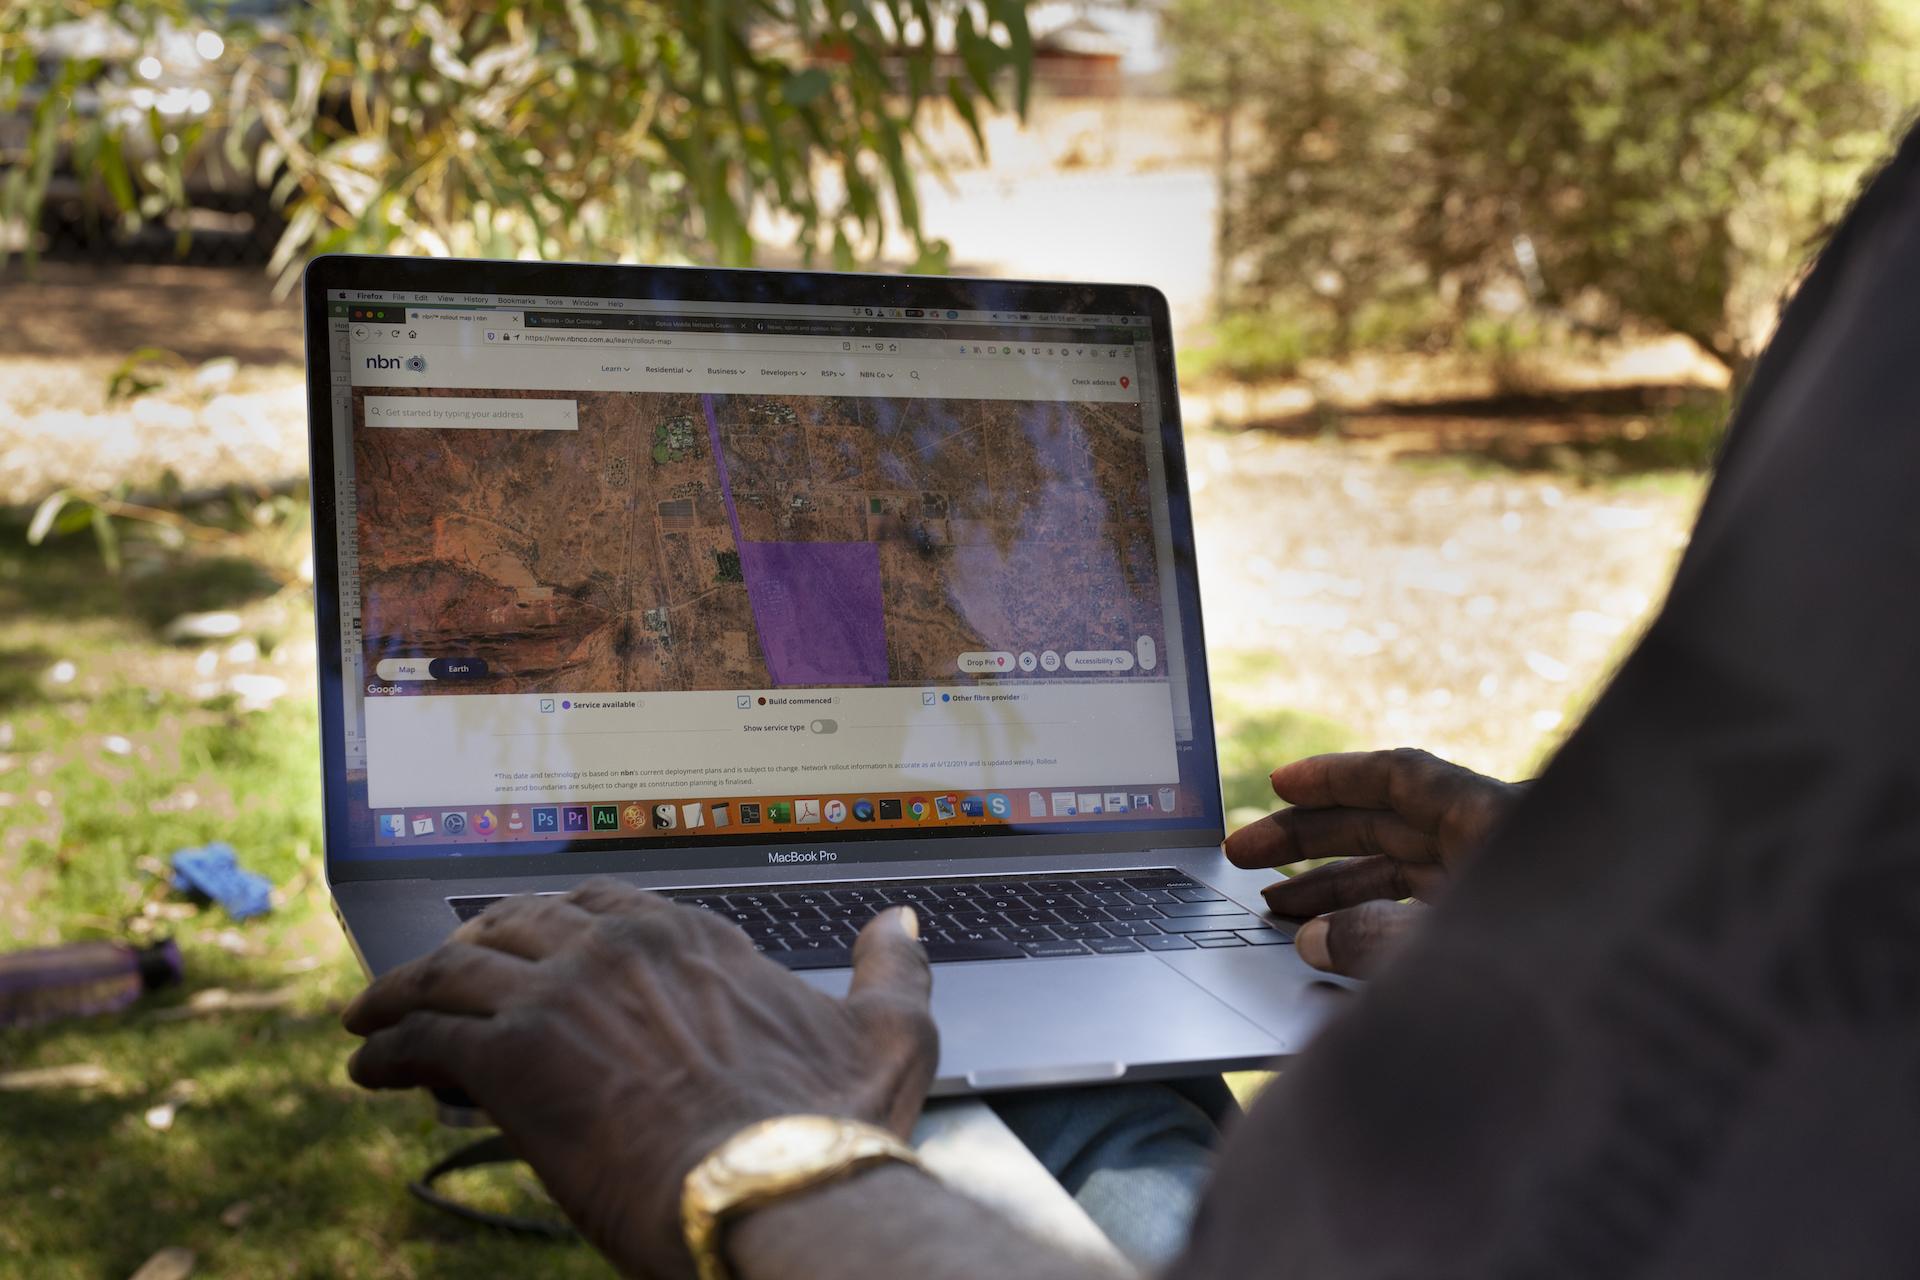 In town camps of Alice, coronavirus raises stakes of digital divide